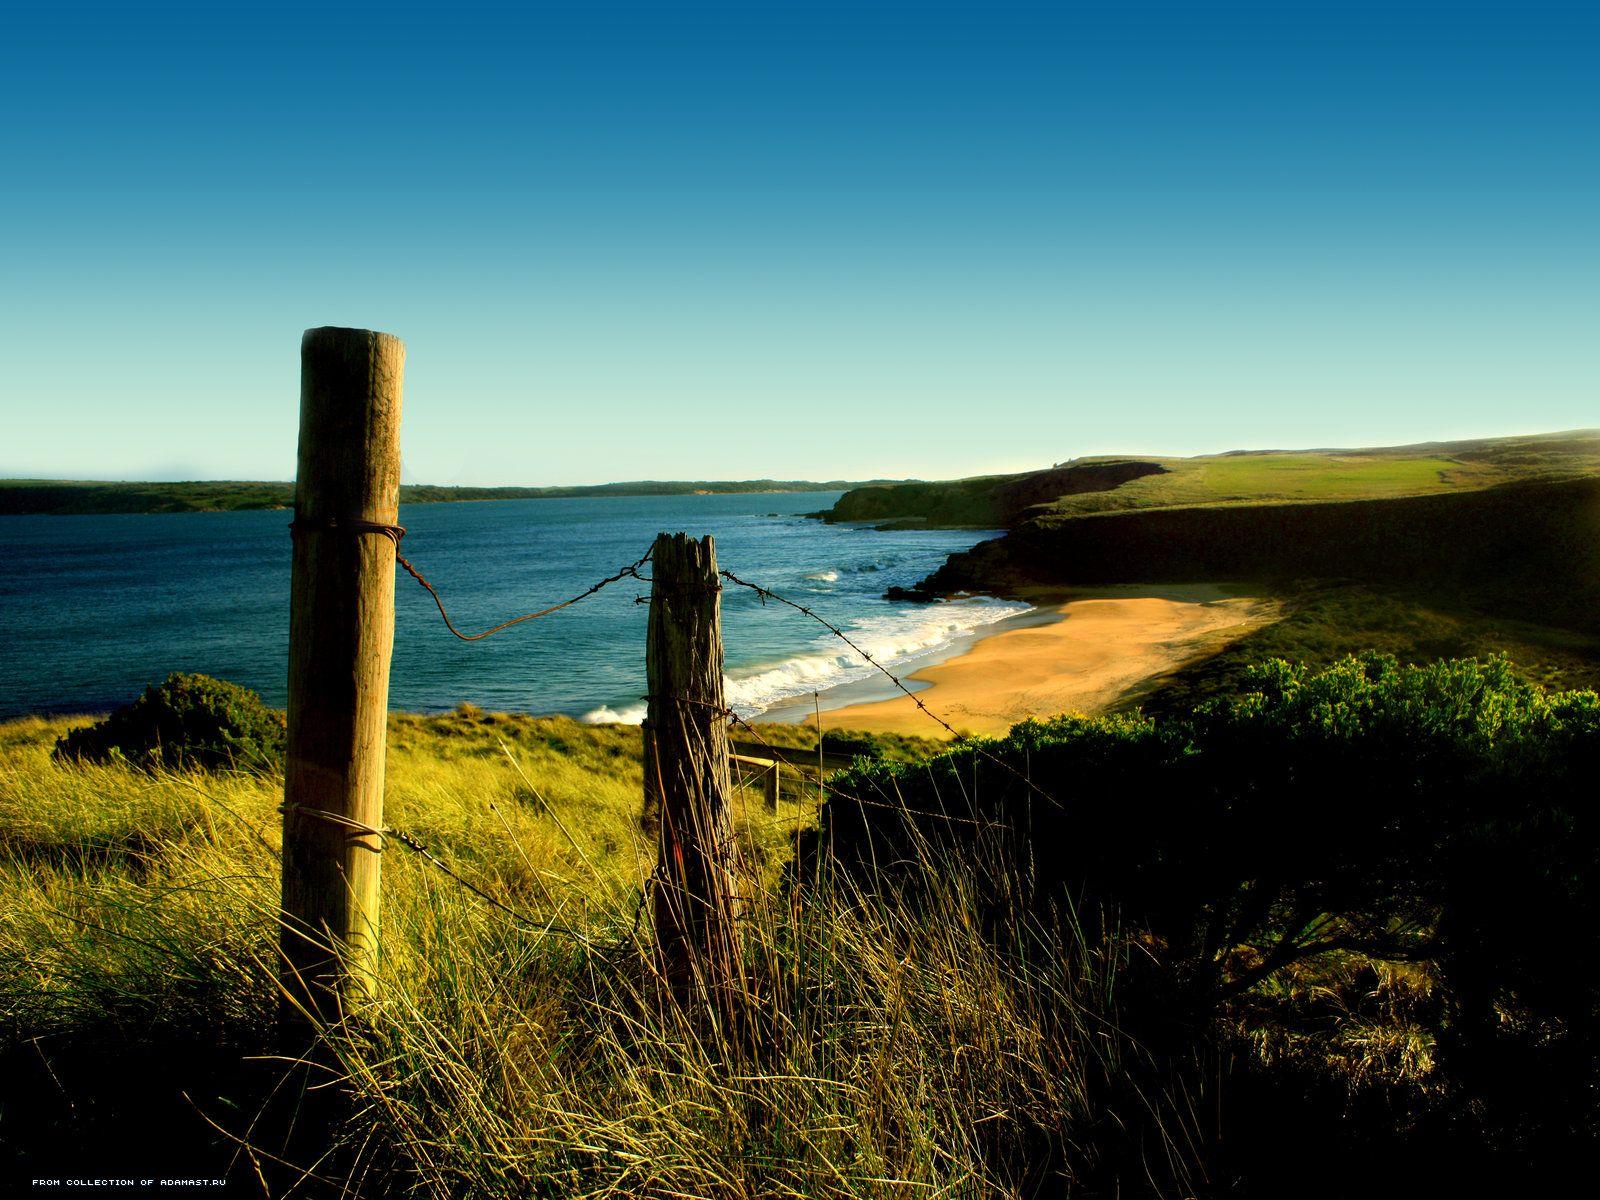 coast wallpaper, coast picture